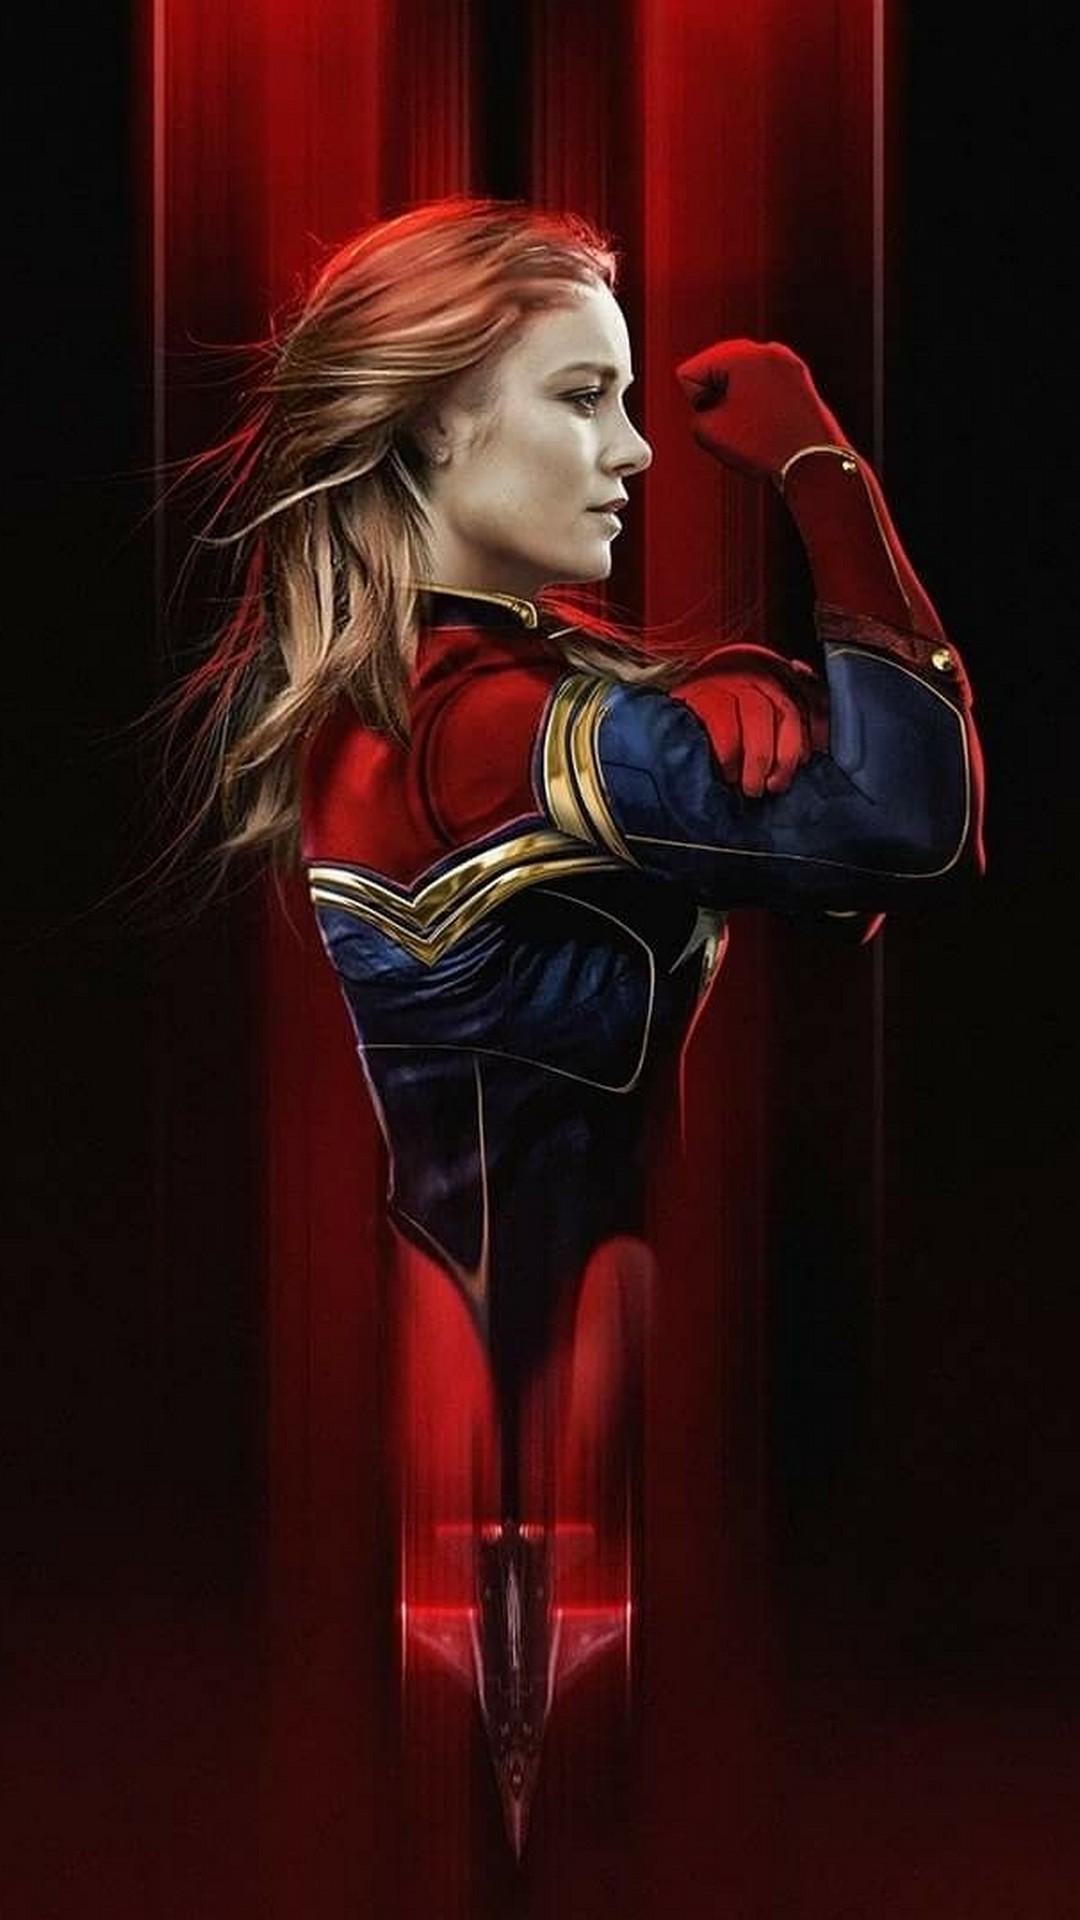 Phones Wallpaper Captain Marvel 2019 2020 Phone Wallpaper HD 1080x1920